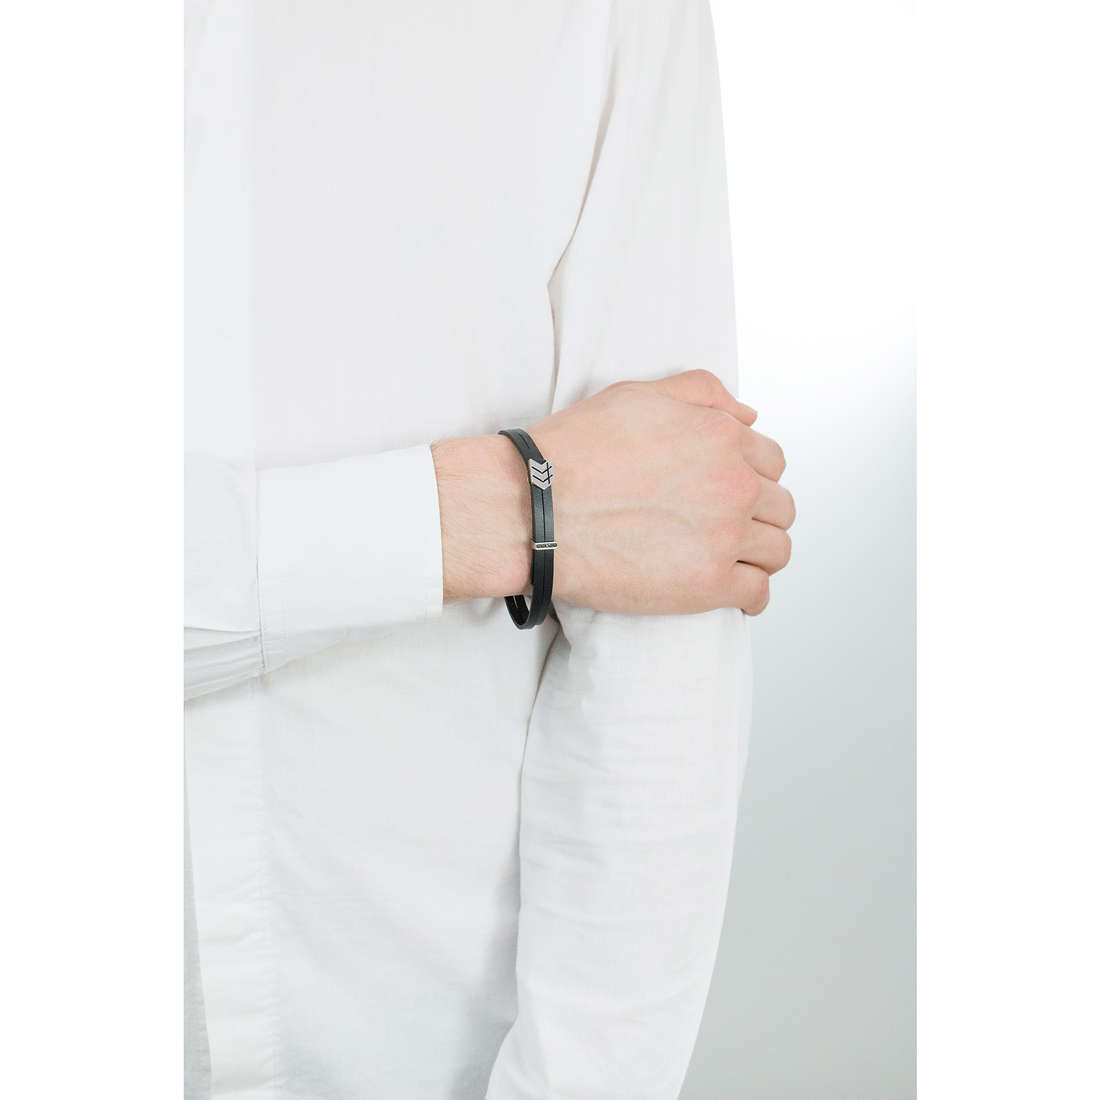 Nomination bracciali Metropolitan uomo 026704/008 indosso